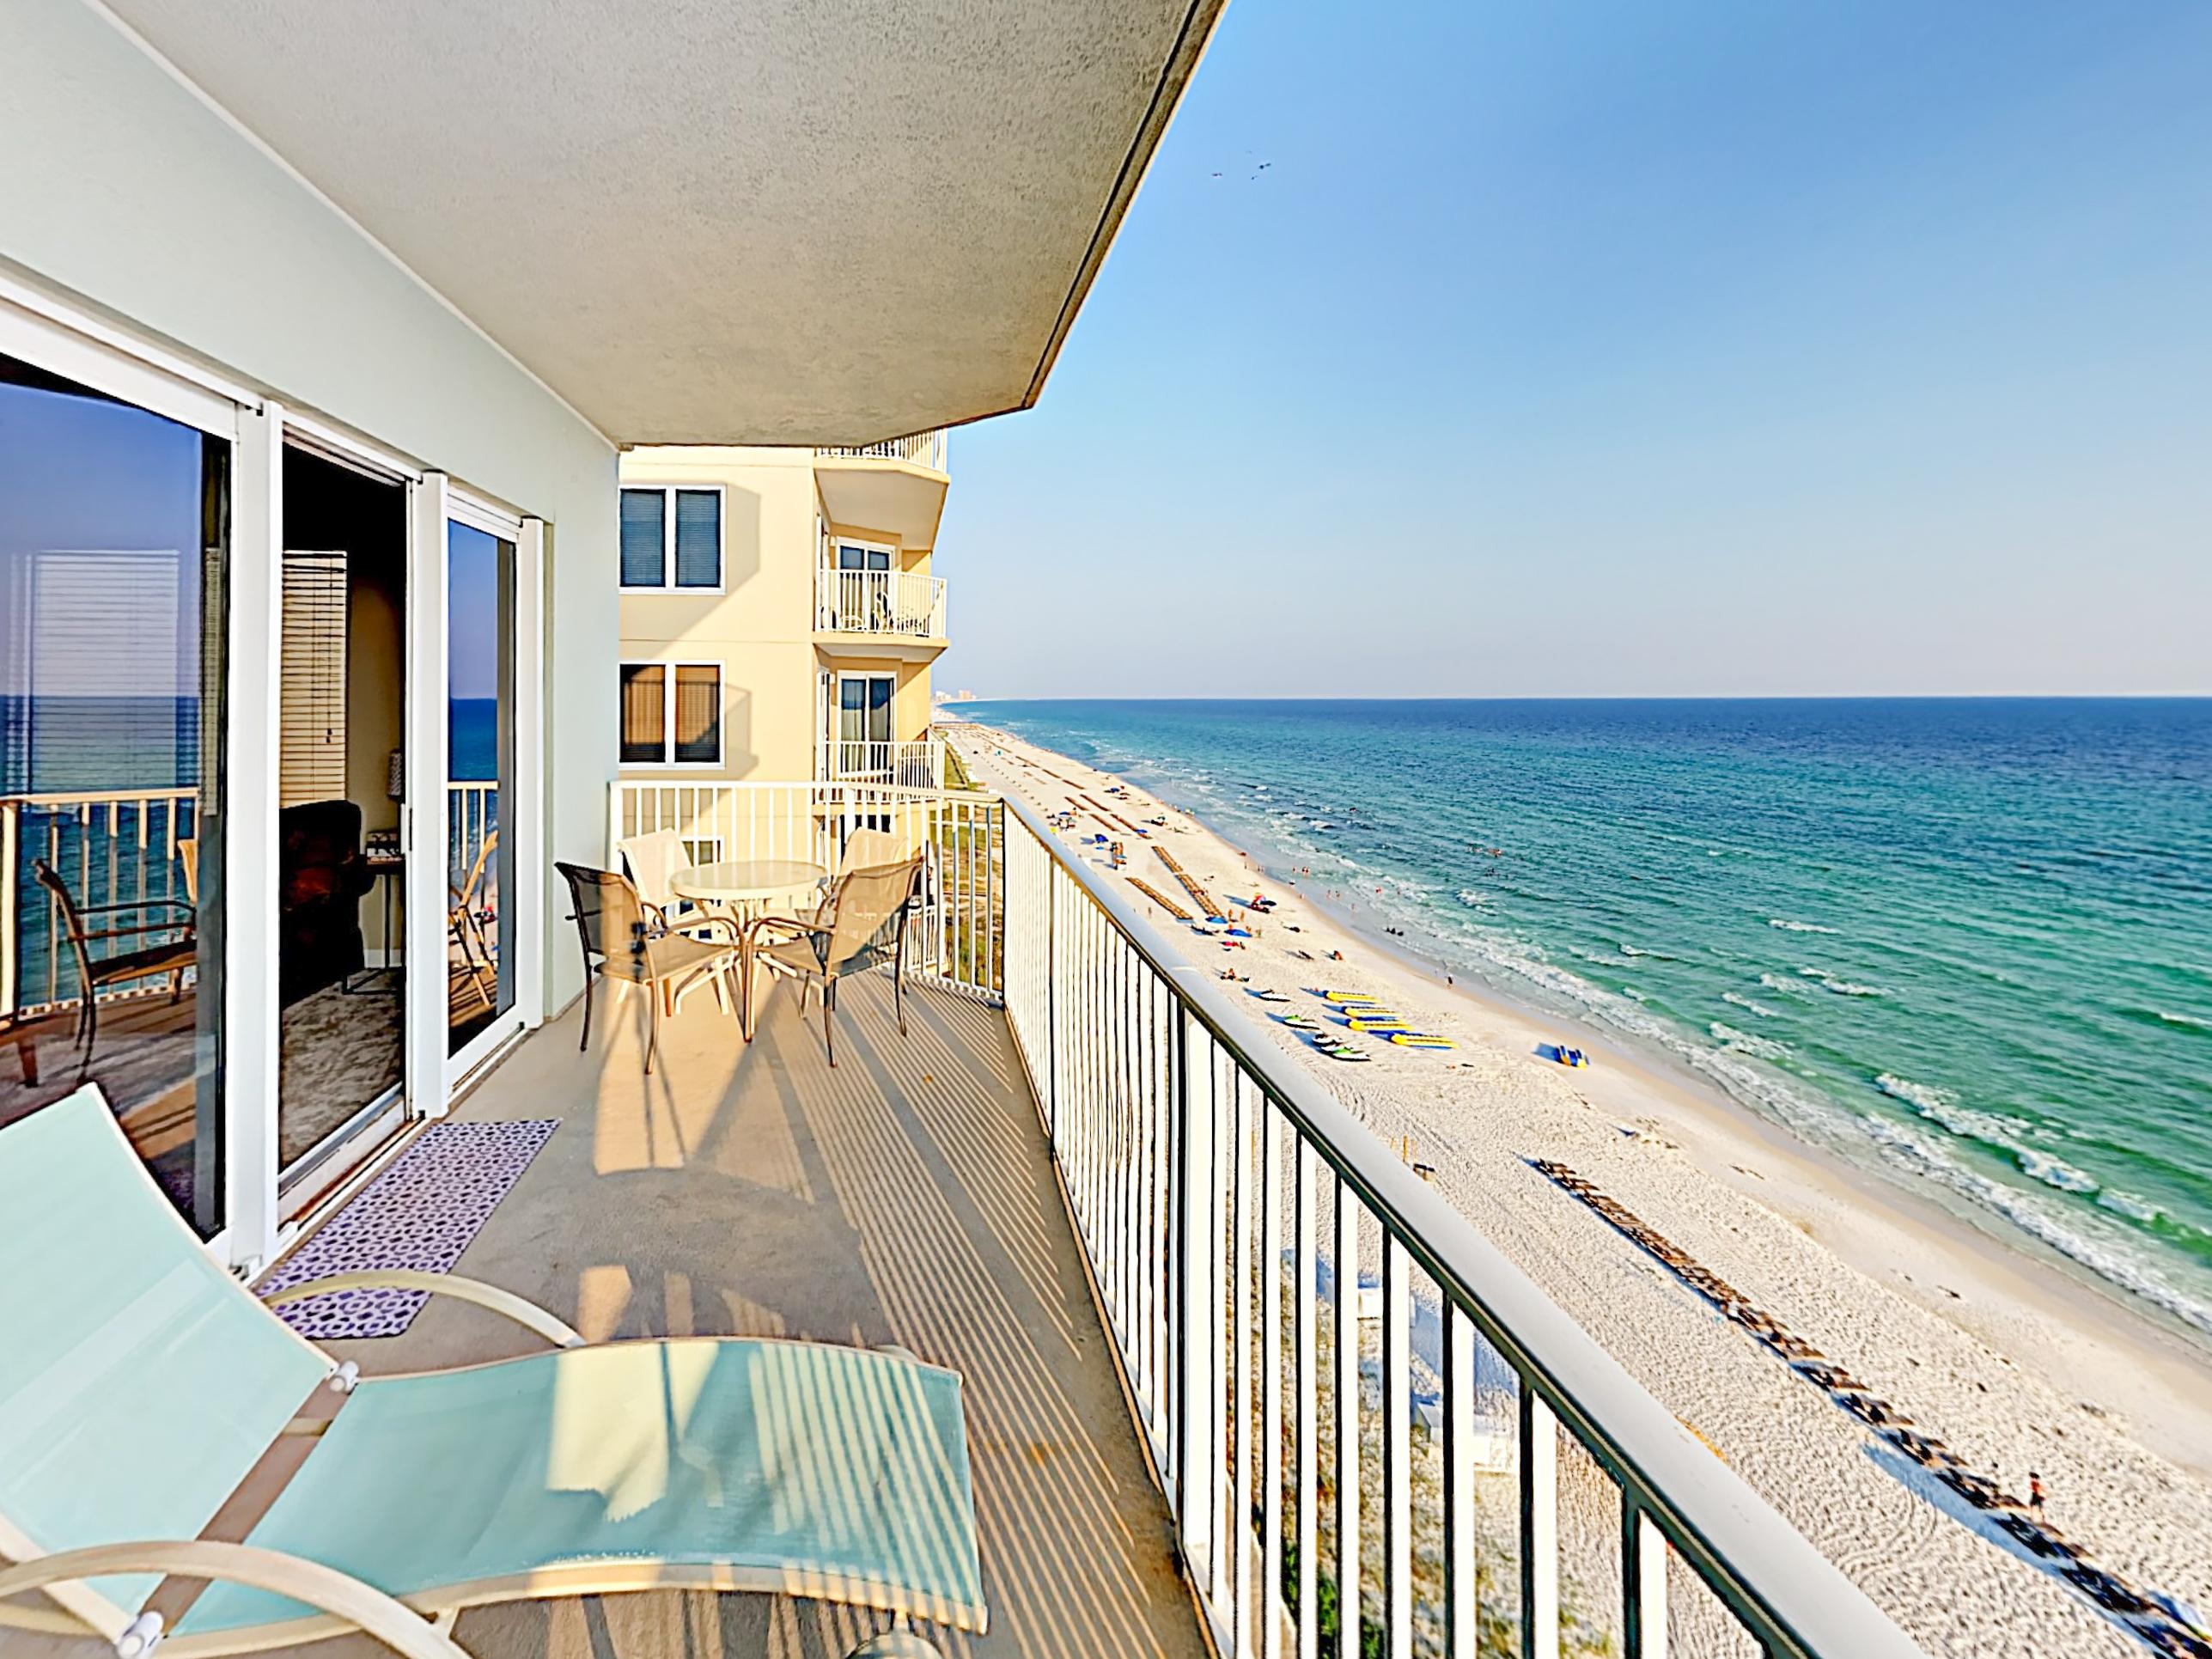 Panama City Beach FL Vacation Rental Welcome to Panama